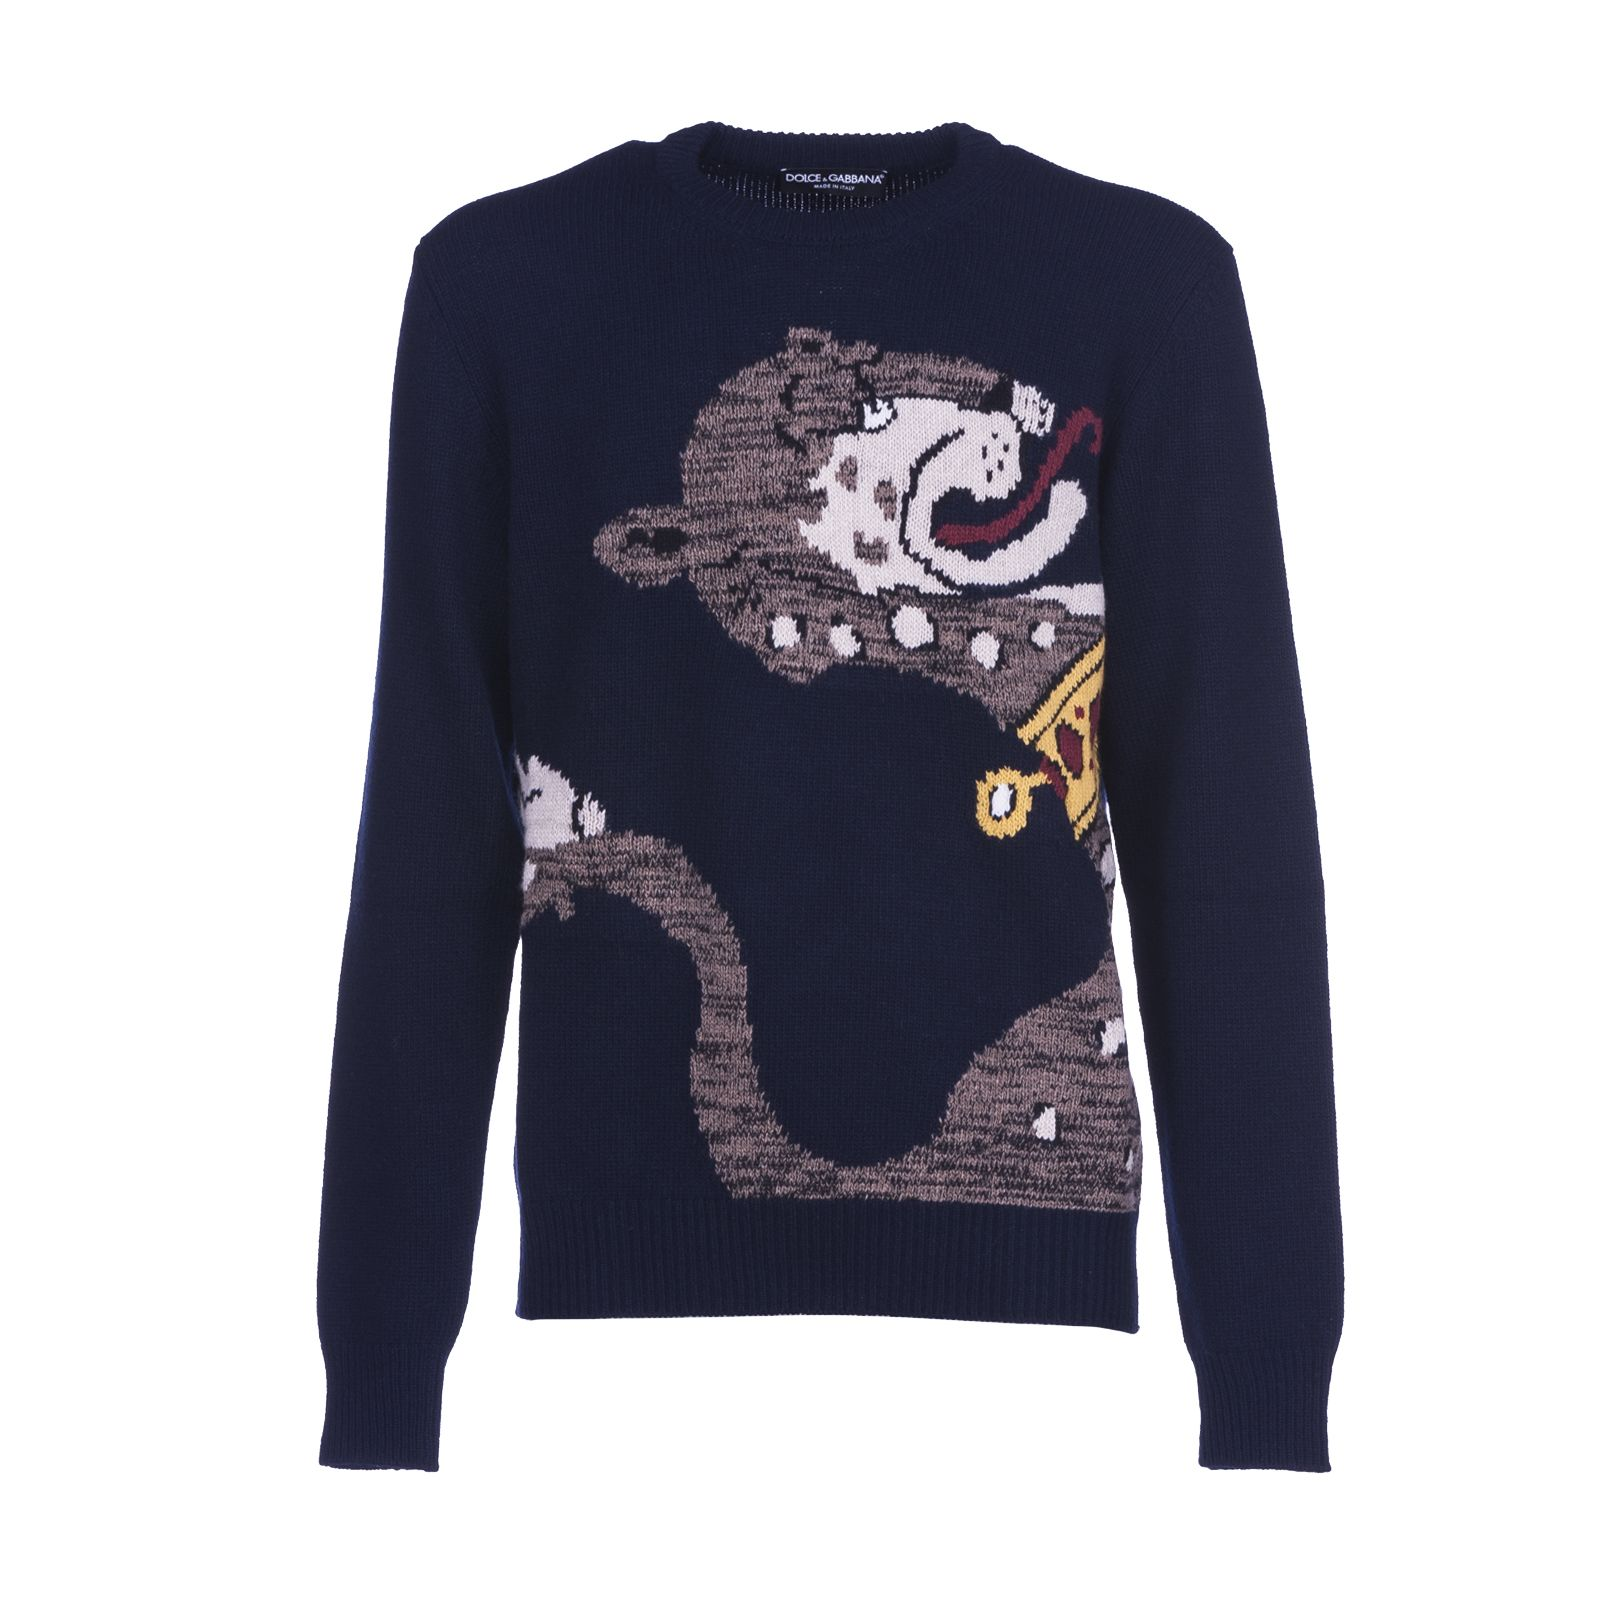 Dolce & Gabbana Intarsia Panther Knit Jumper